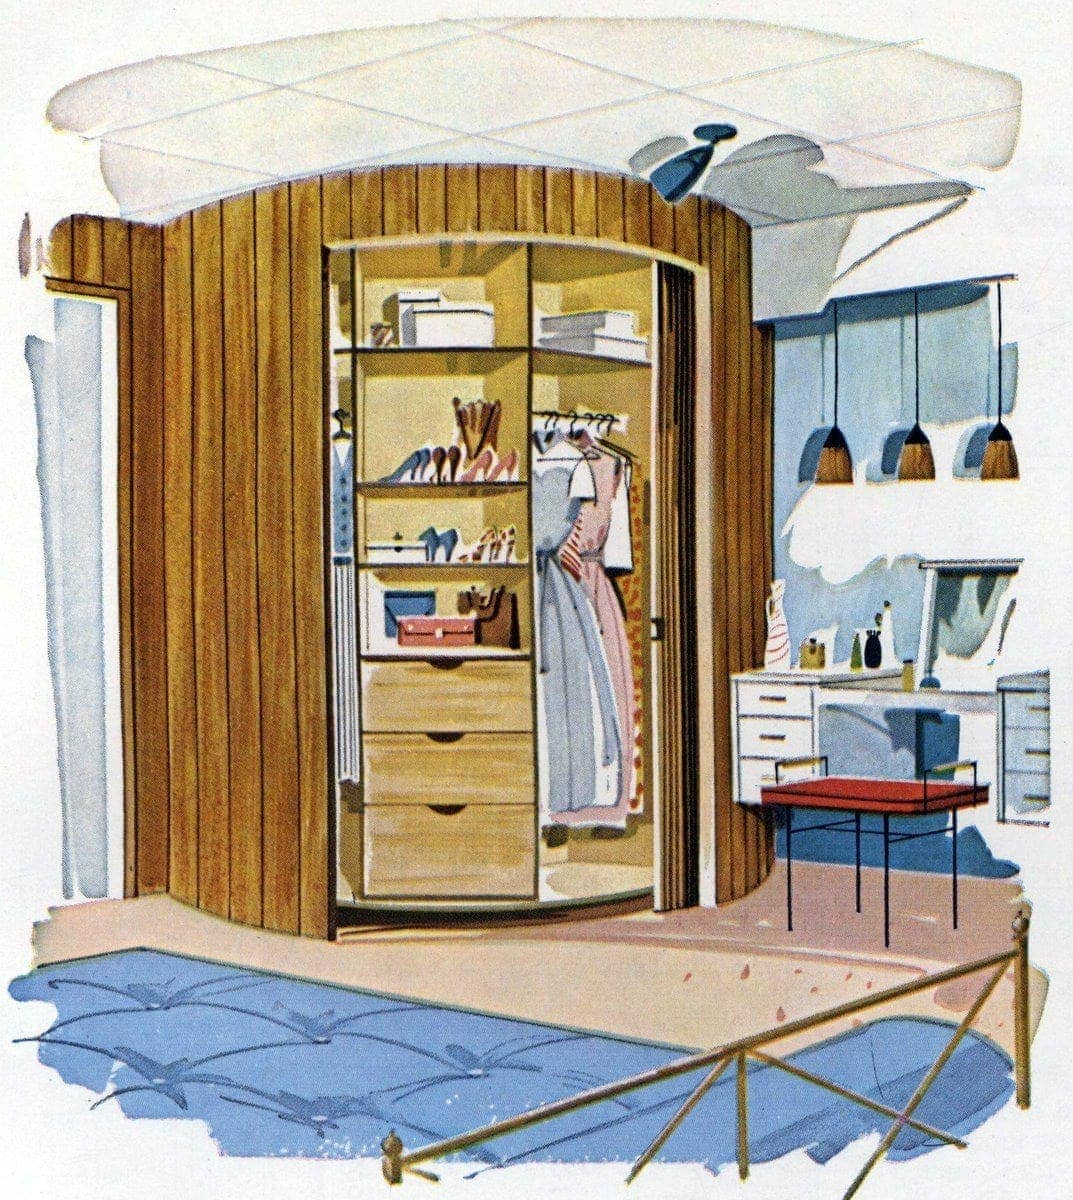 How To Make A U0027Lazy Susanu0027 Wardrobe Closet For Your Bedroom (1961)